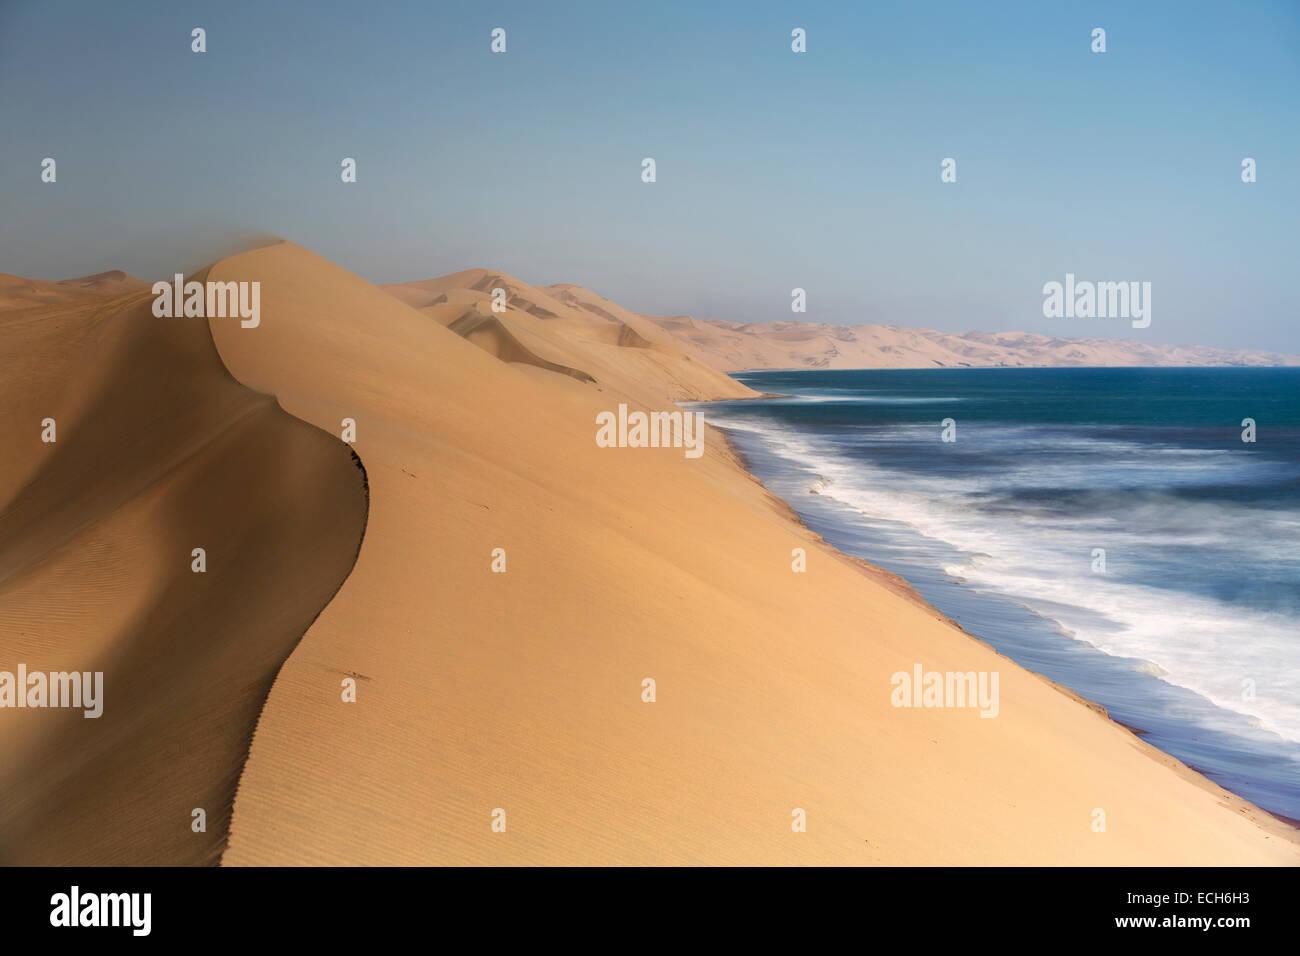 Dunes de sable, Désert du Namib, Swakopmund, Namibie Photo Stock